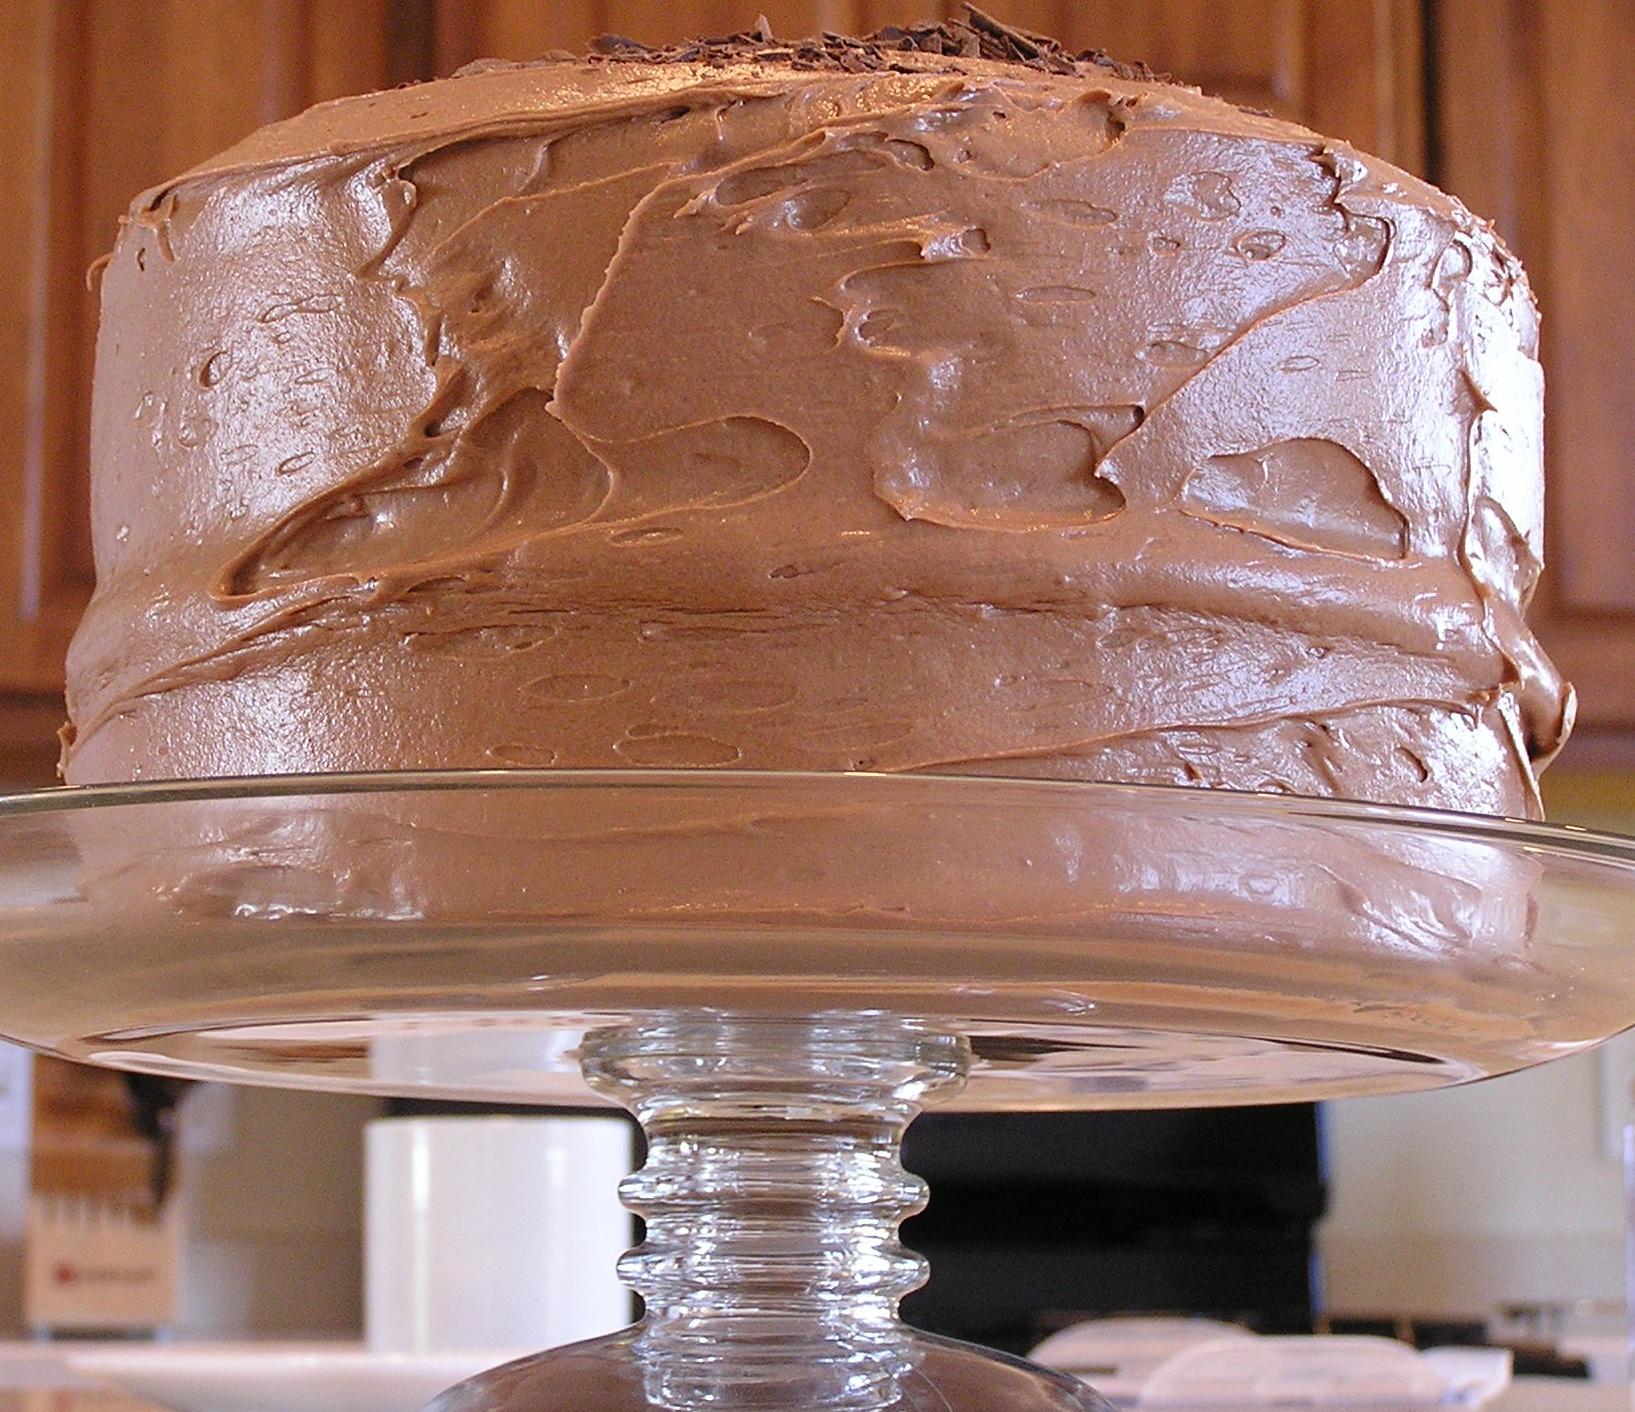 chocolate-cake-016b